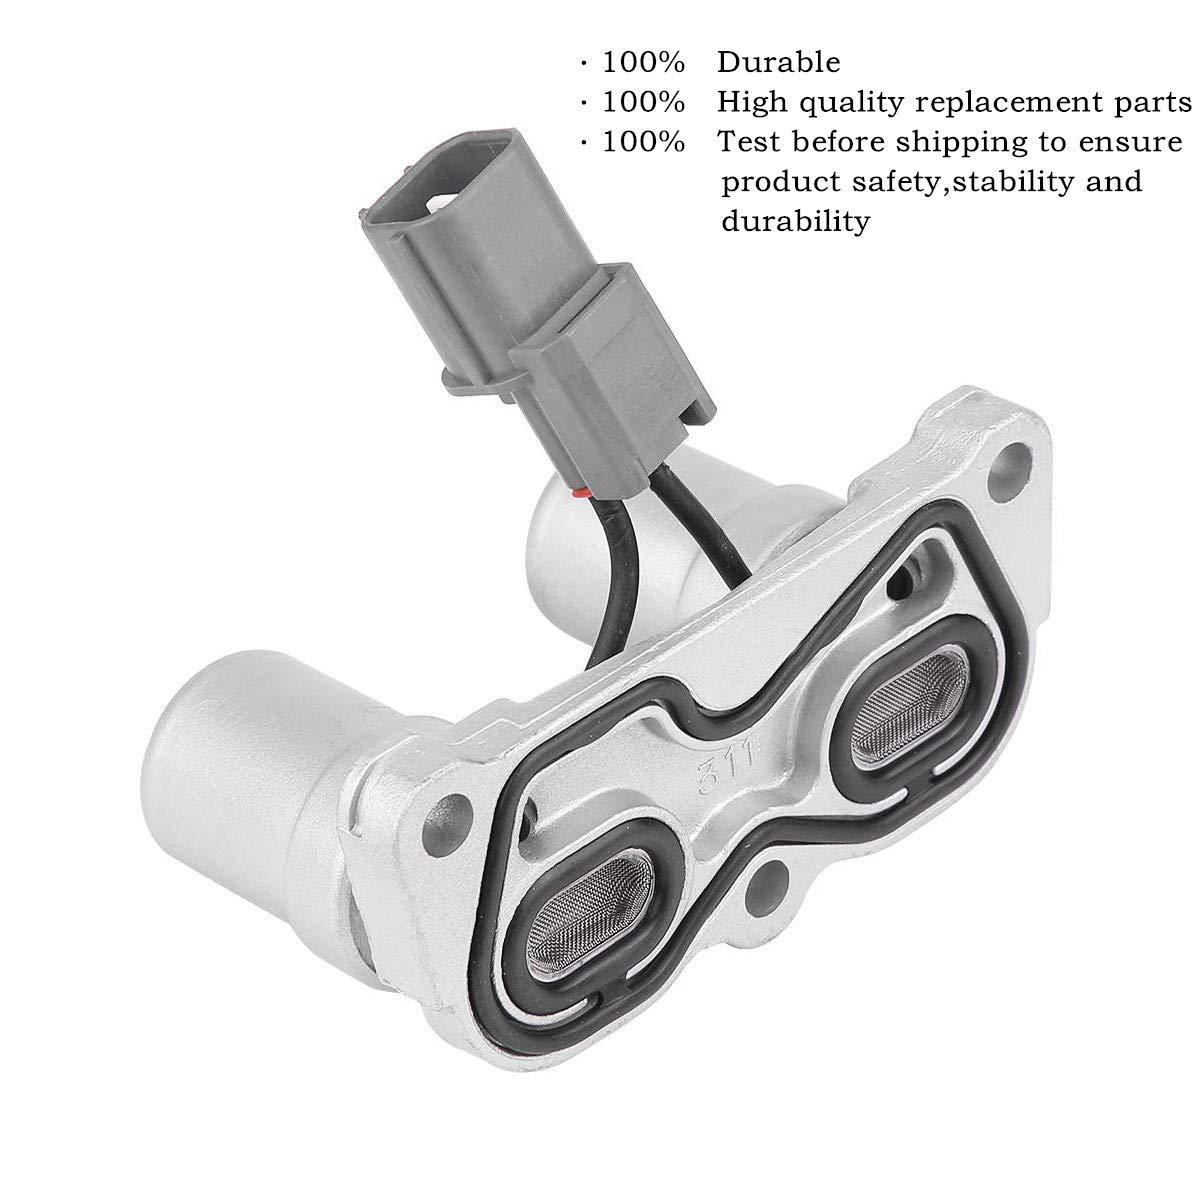 Transmission Dual Shift Solenoid 28300-P24-J01 for 1991-2001 Honda Civic 1997-2001 Honda CRV 1993-1997 Honda Del Sol 1994-2000 ACURA INTEGRA